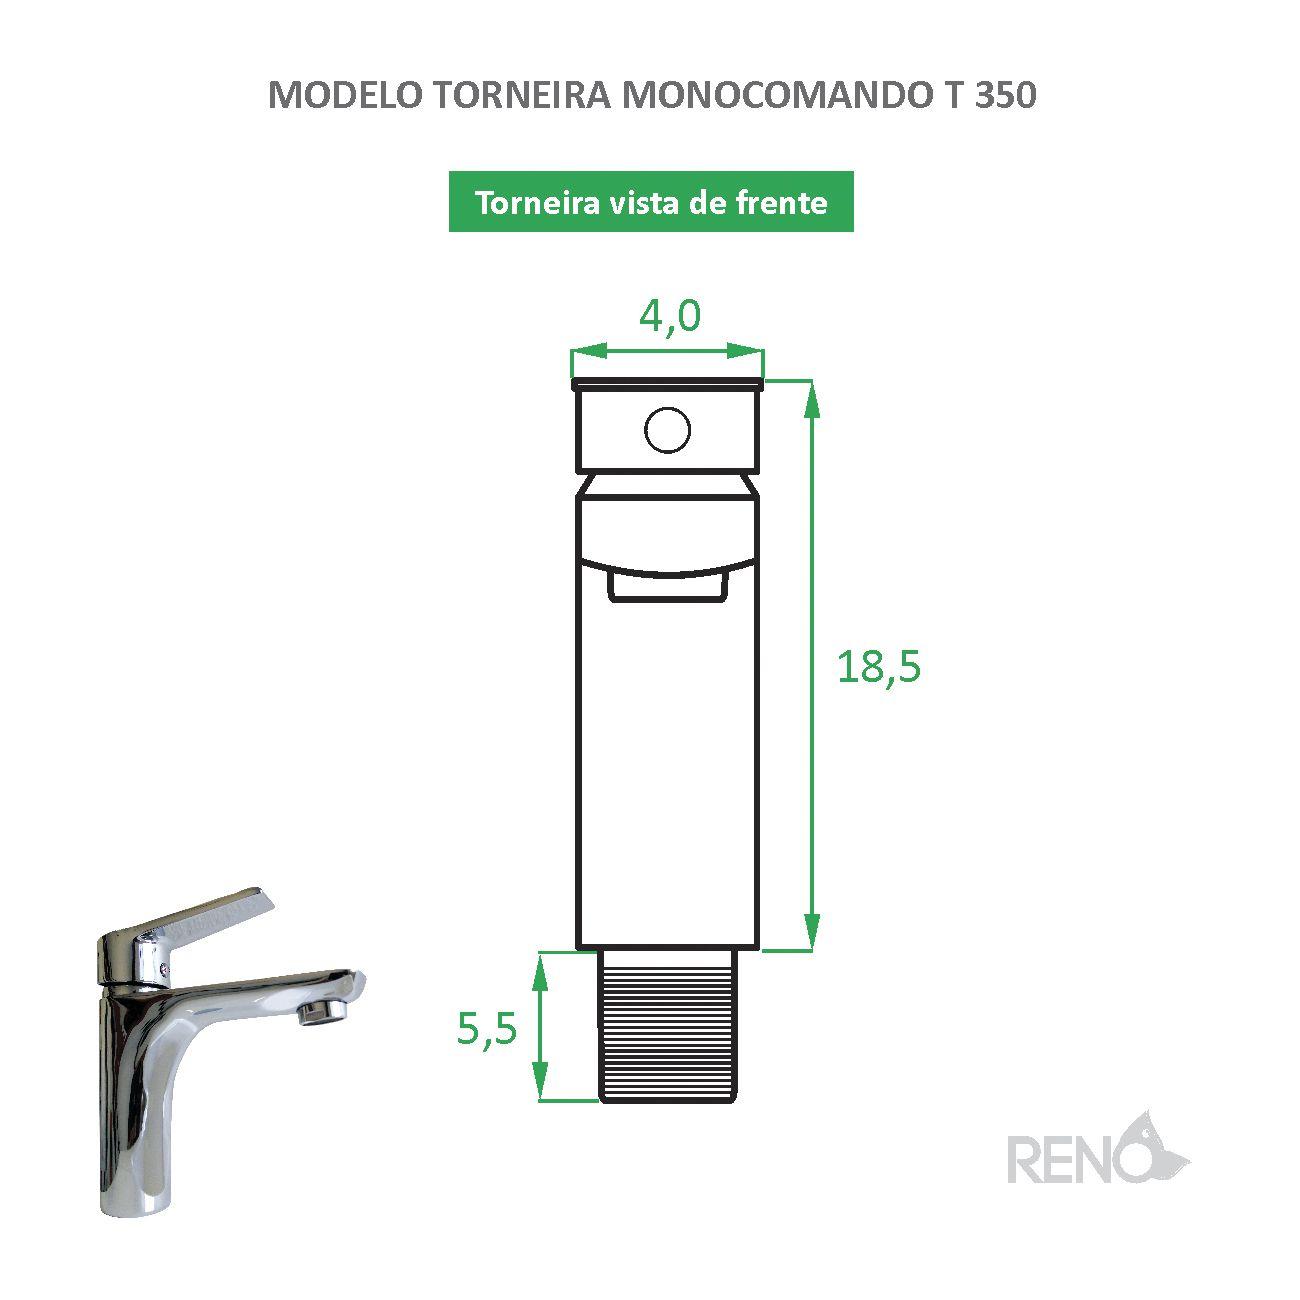 Torneira Monocomando T 350